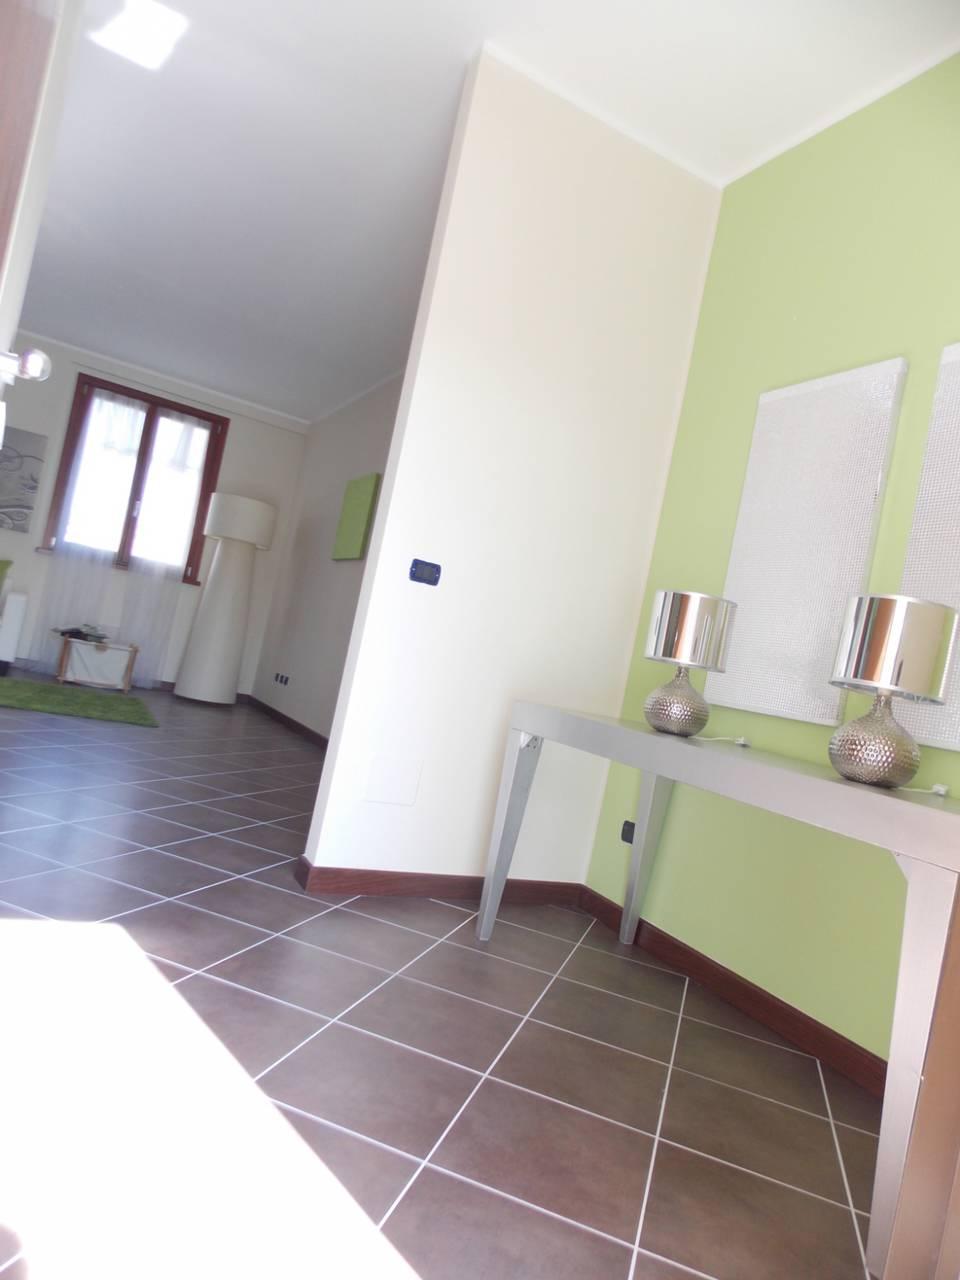 Monolocale-in-vendita-a-San-Giuliano-Milanese-6